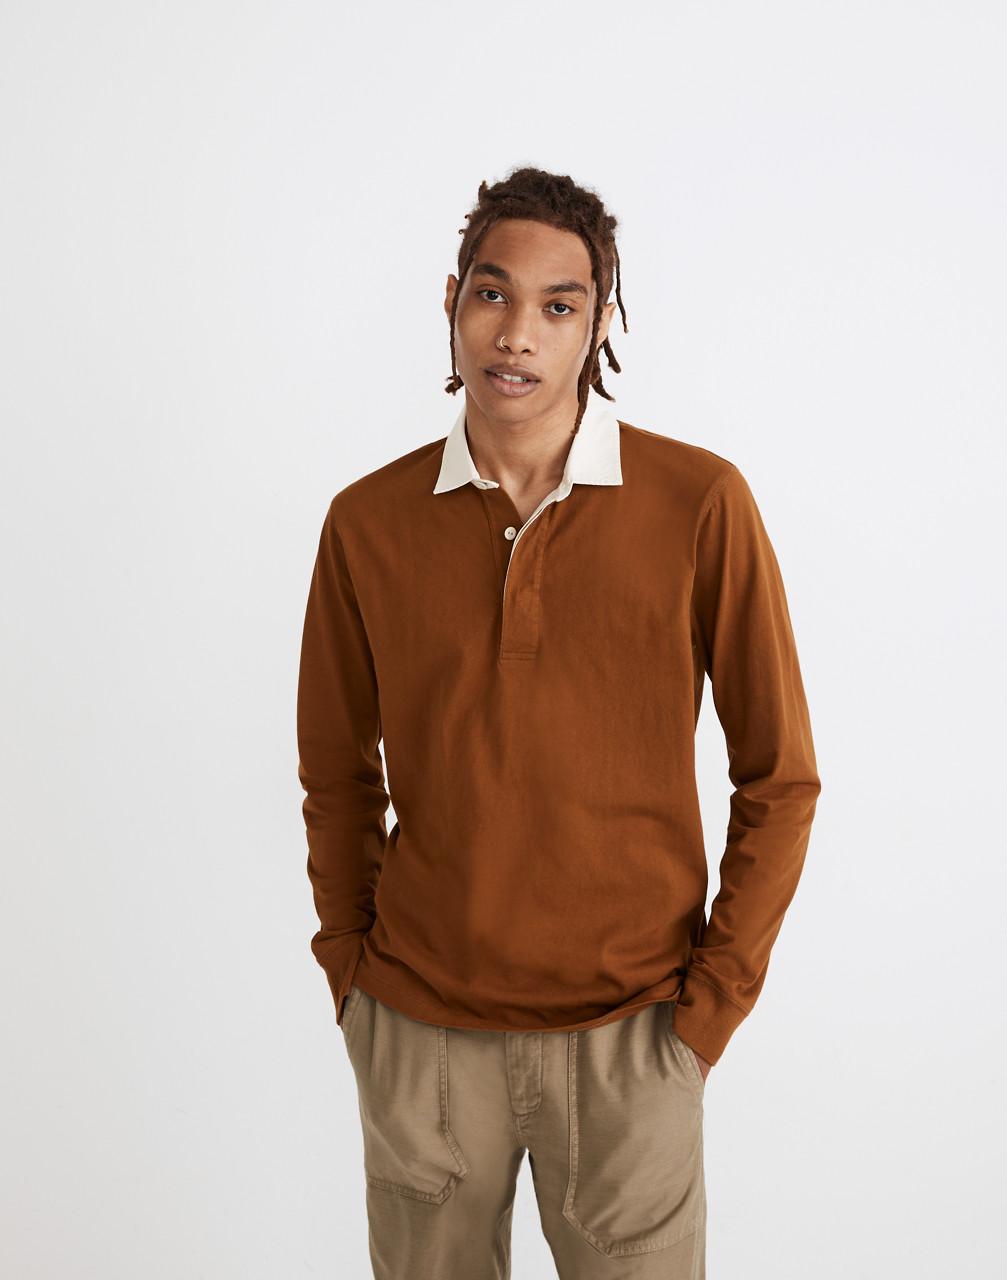 Mens Vintage Shirts – Casual, Dress, T-shirts, Polos Rugby Shirt $79.50 AT vintagedancer.com